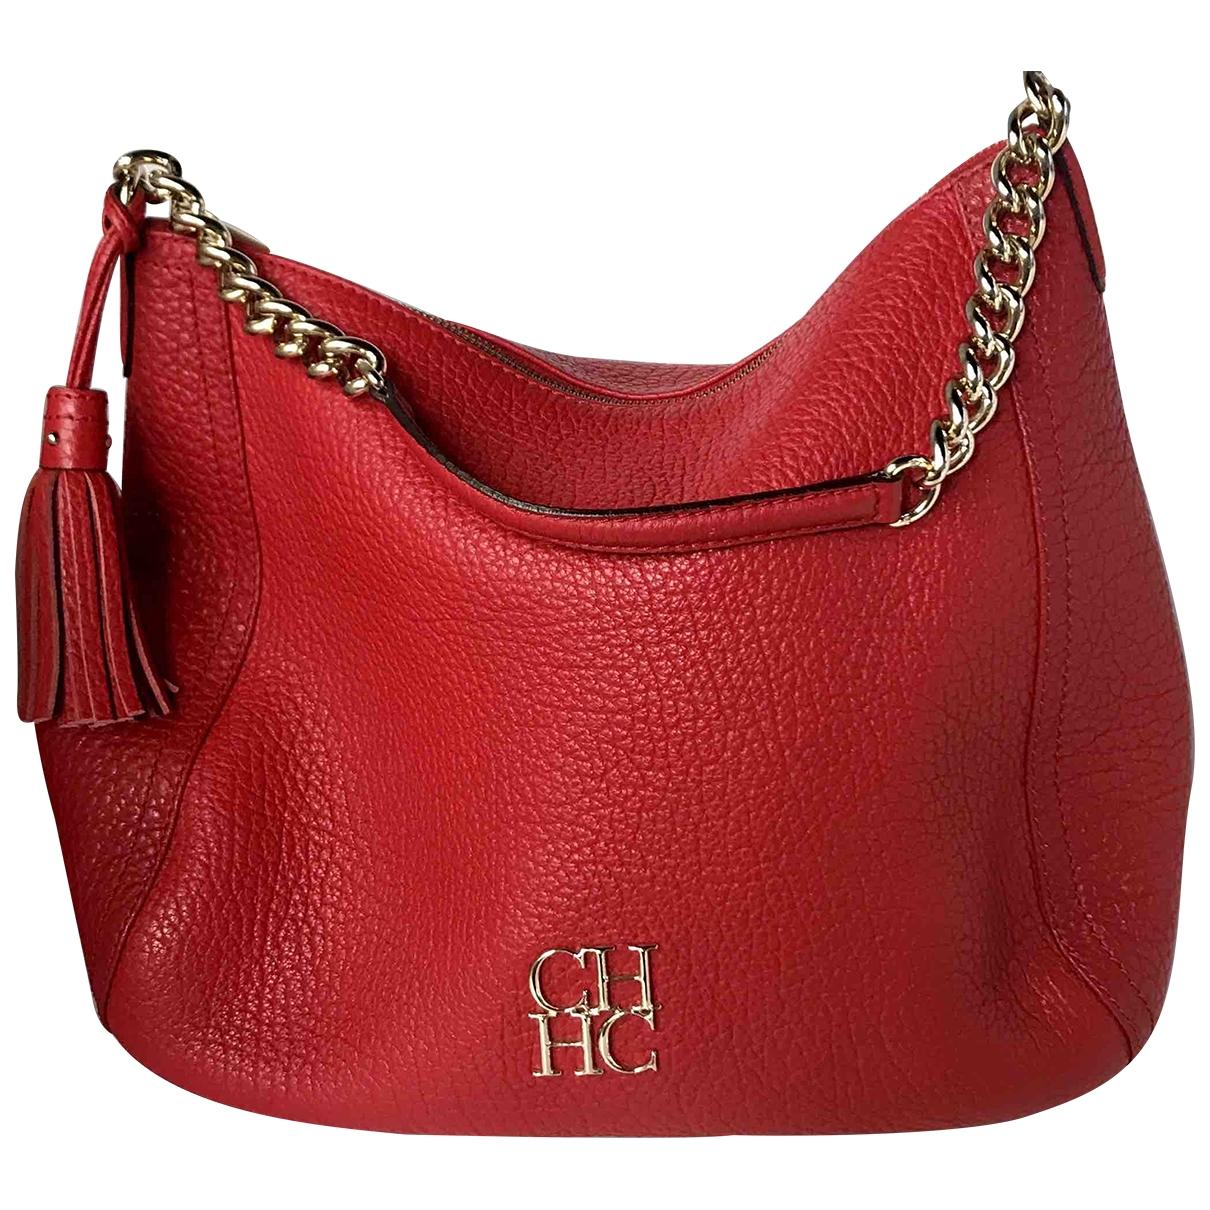 Carolina Herrera \N Red Leather handbag for Women \N